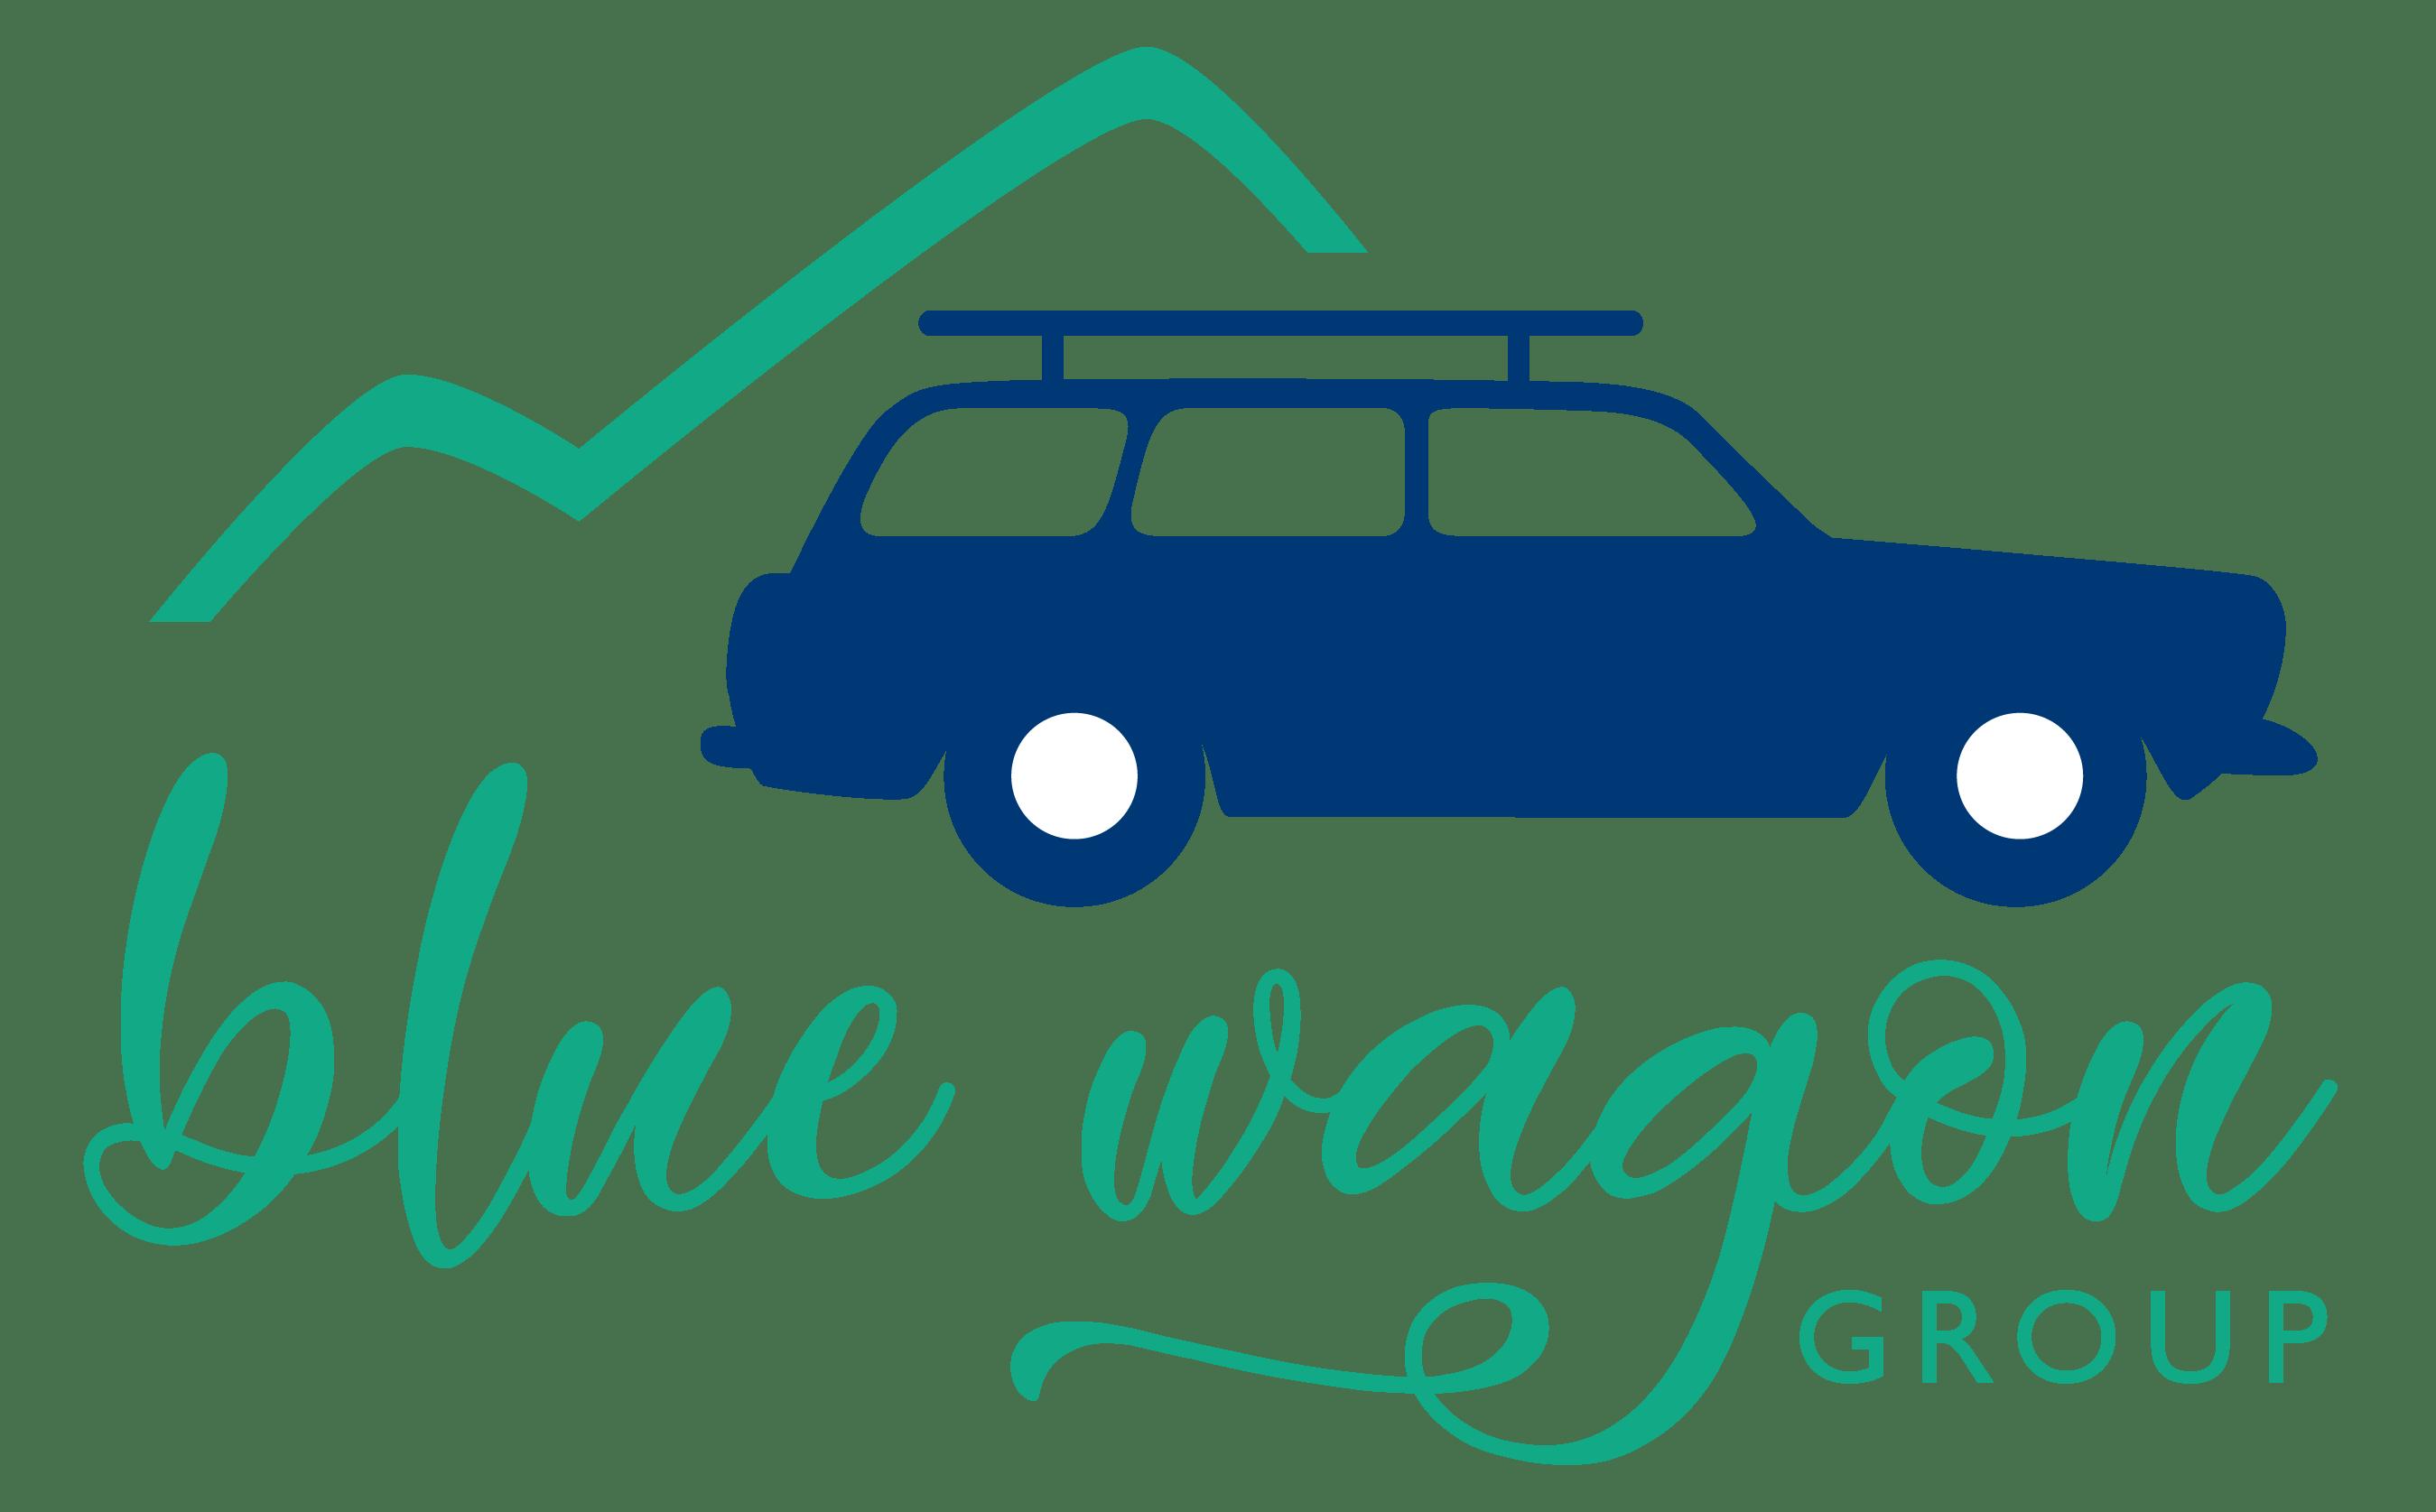 Blue Wagon Group